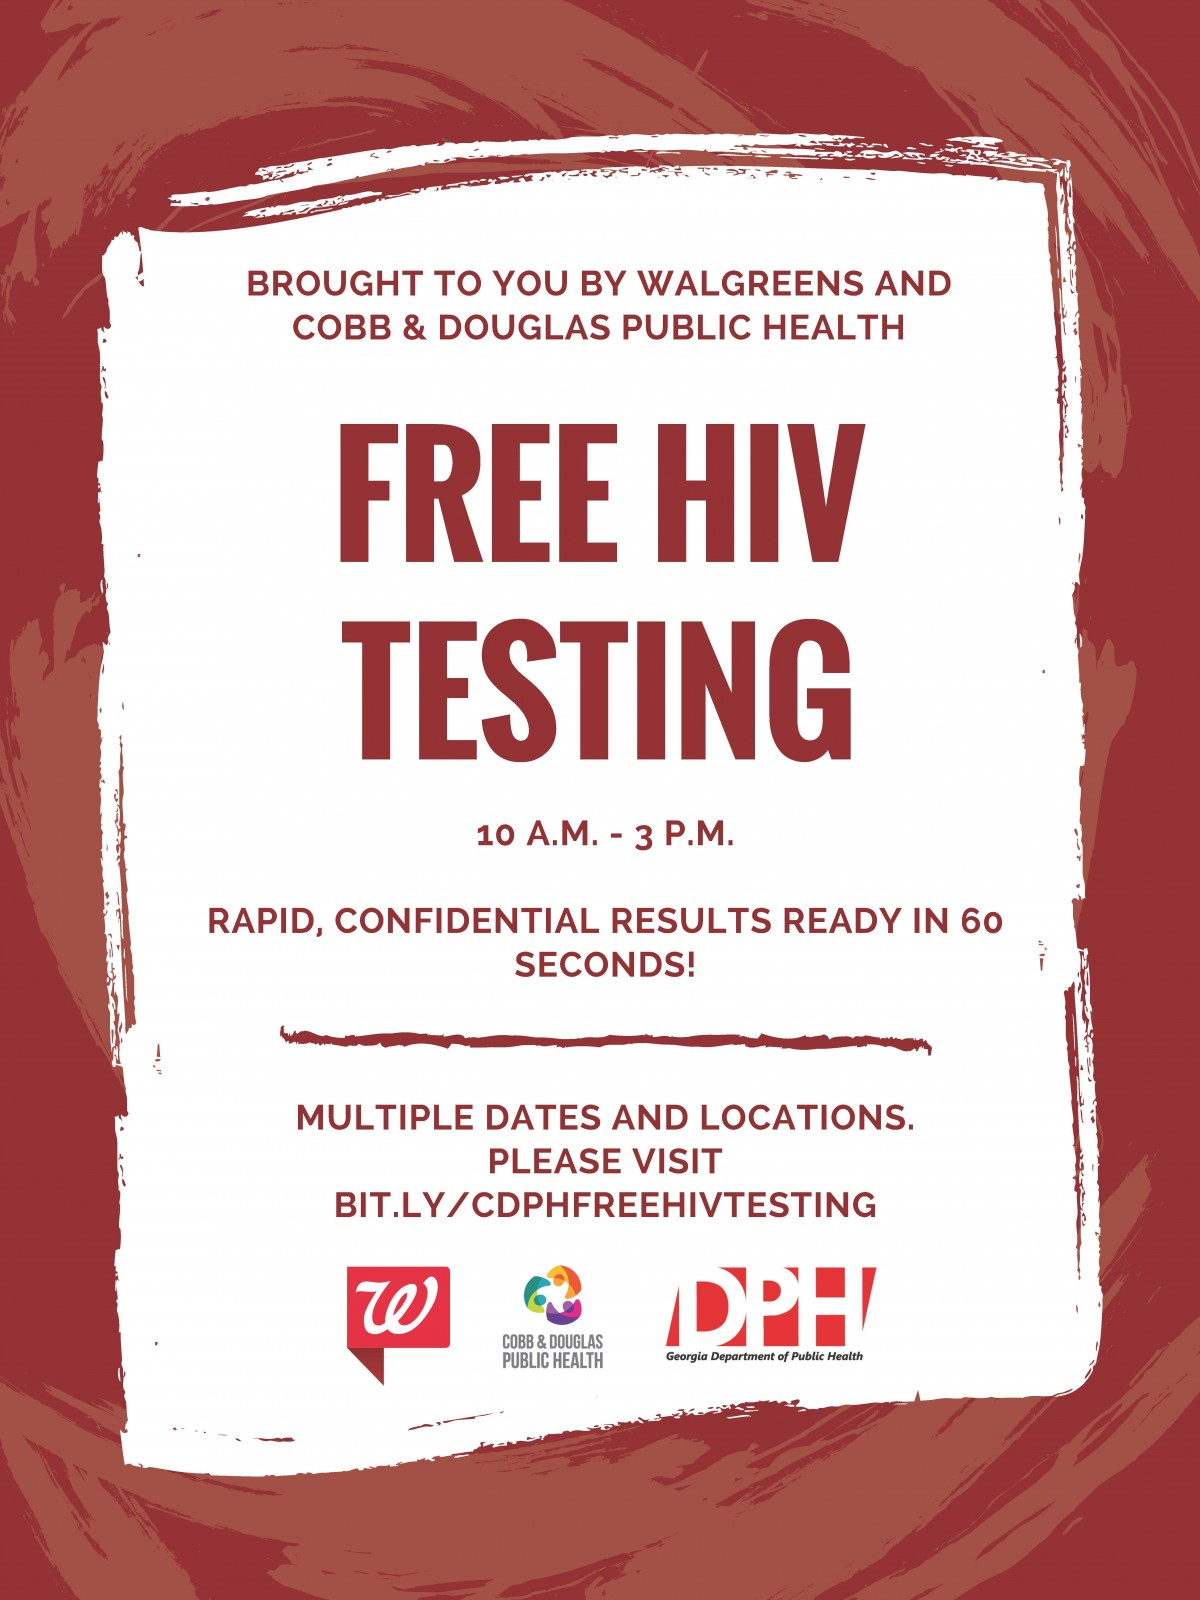 free rapid hiv testing near me